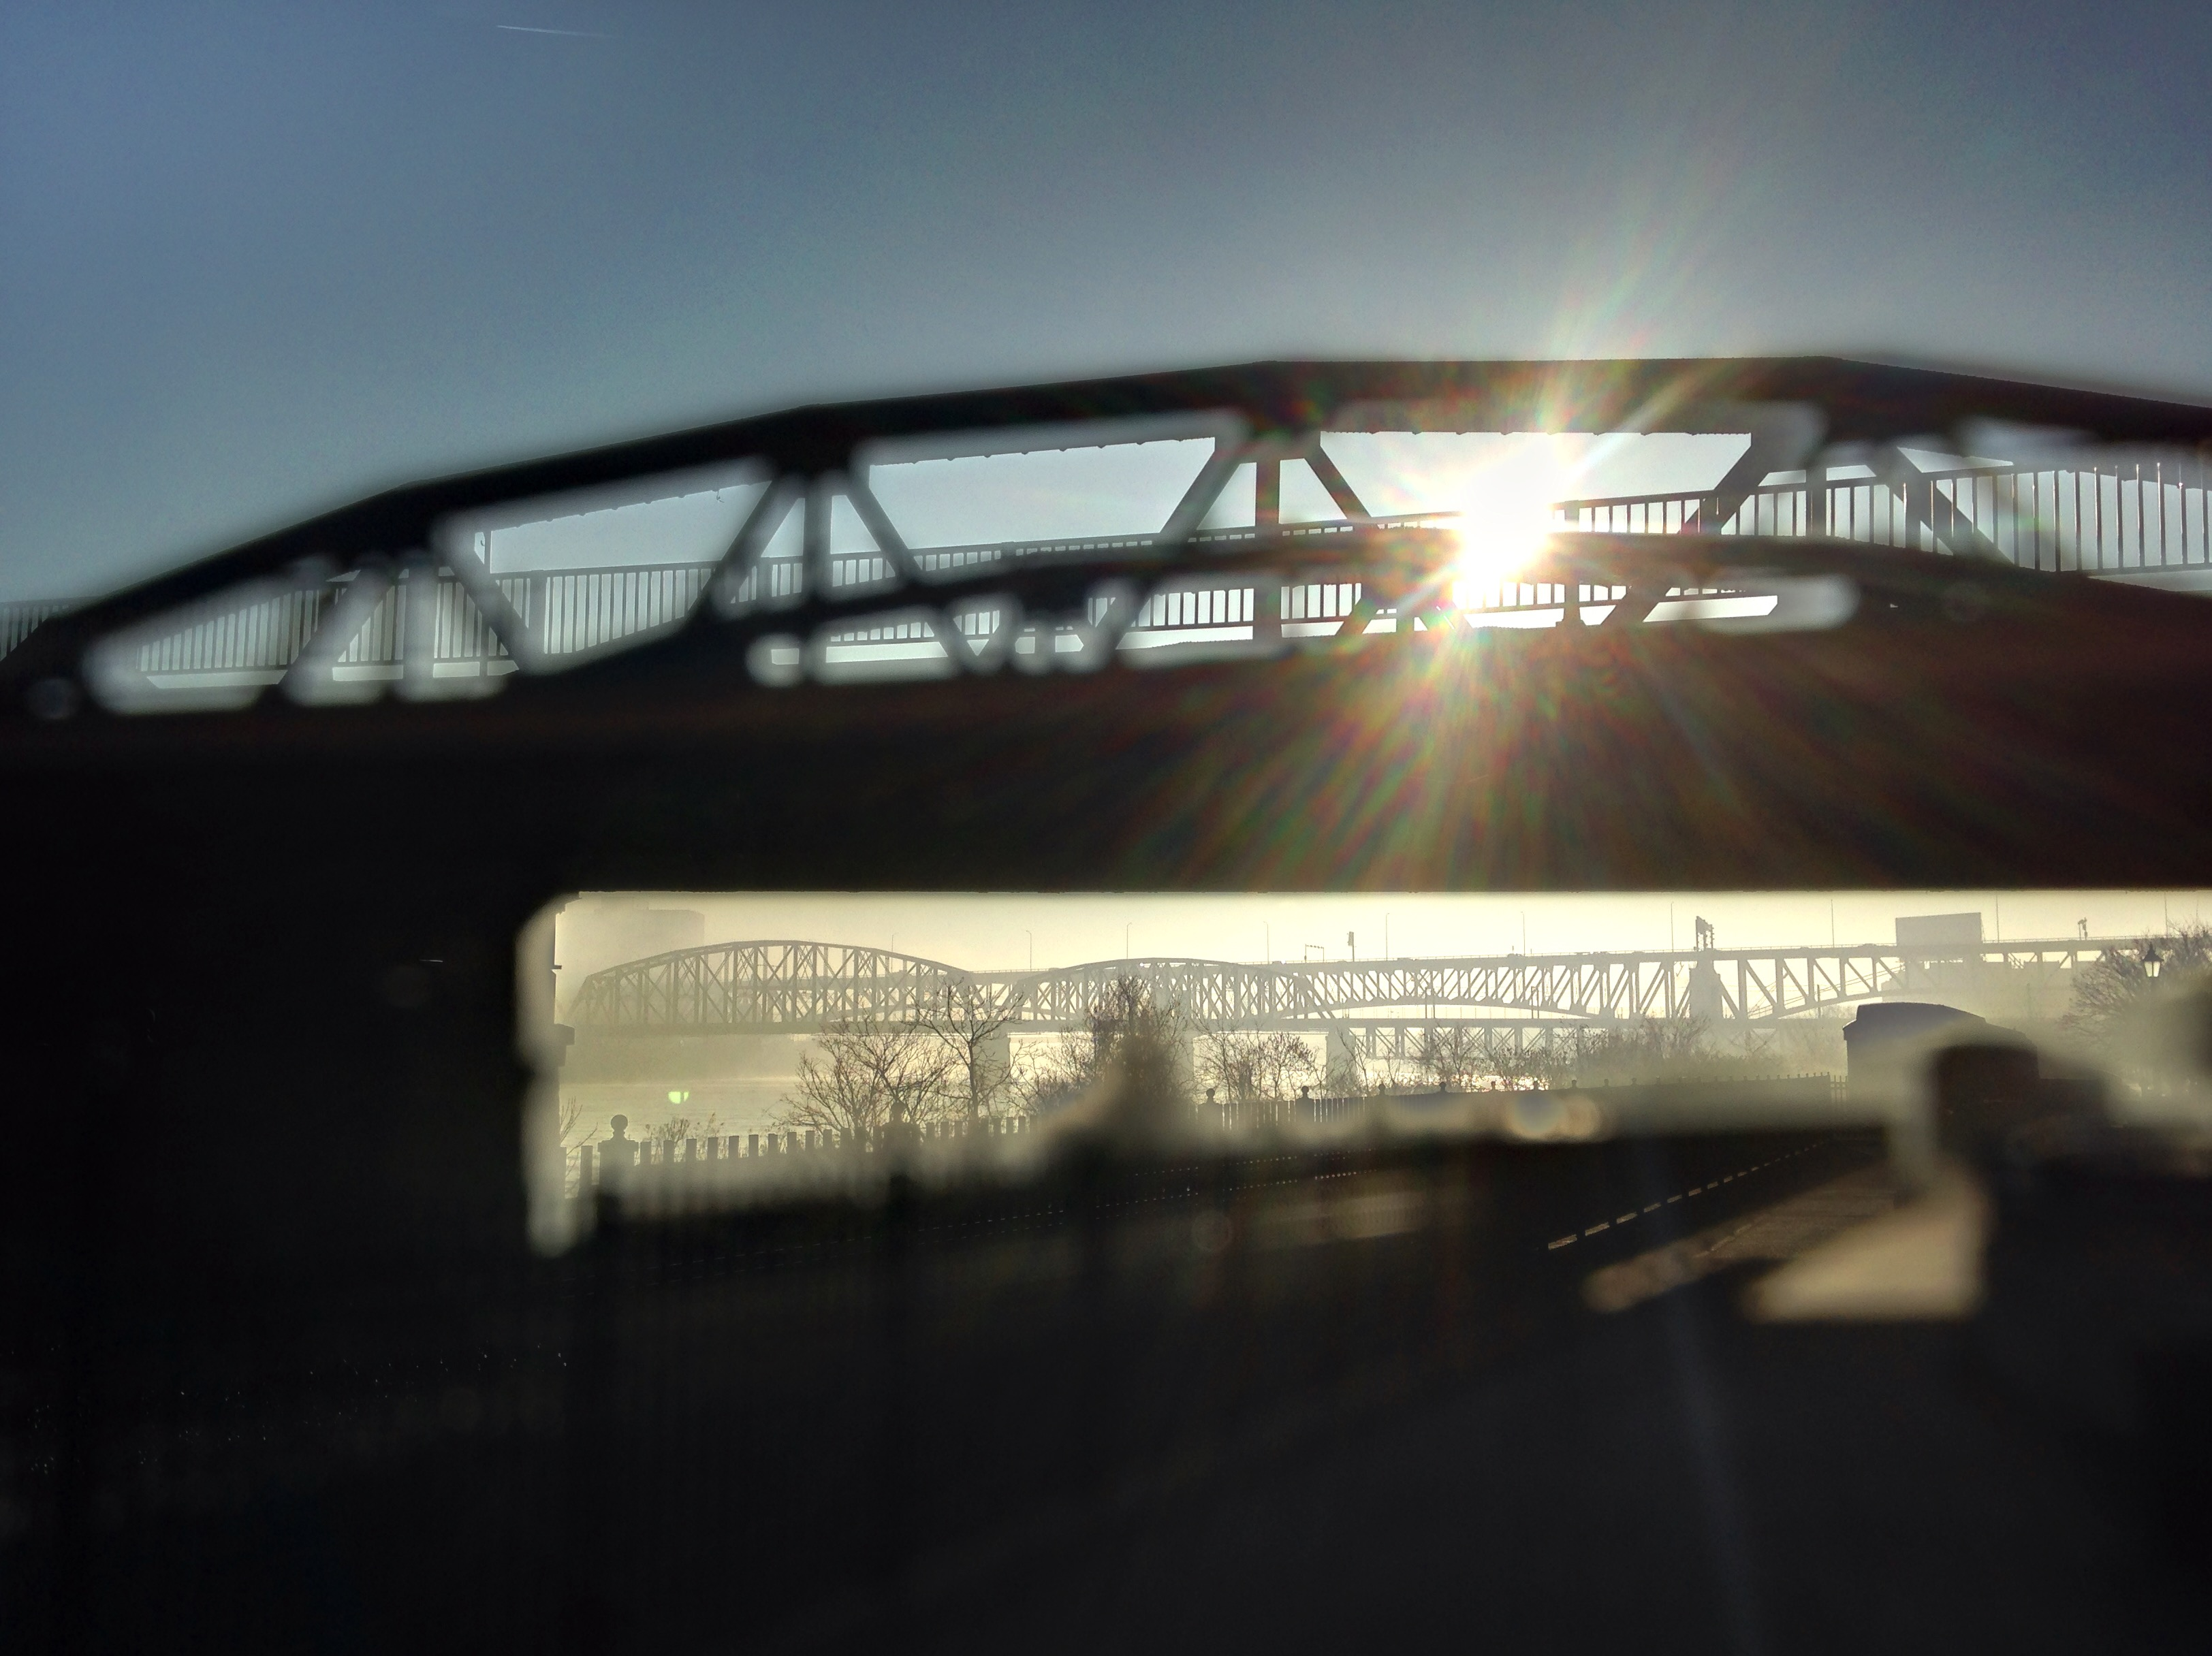 Smithfield Street Bridge on a Foggy March Morning - iPhone photo by Glen Green